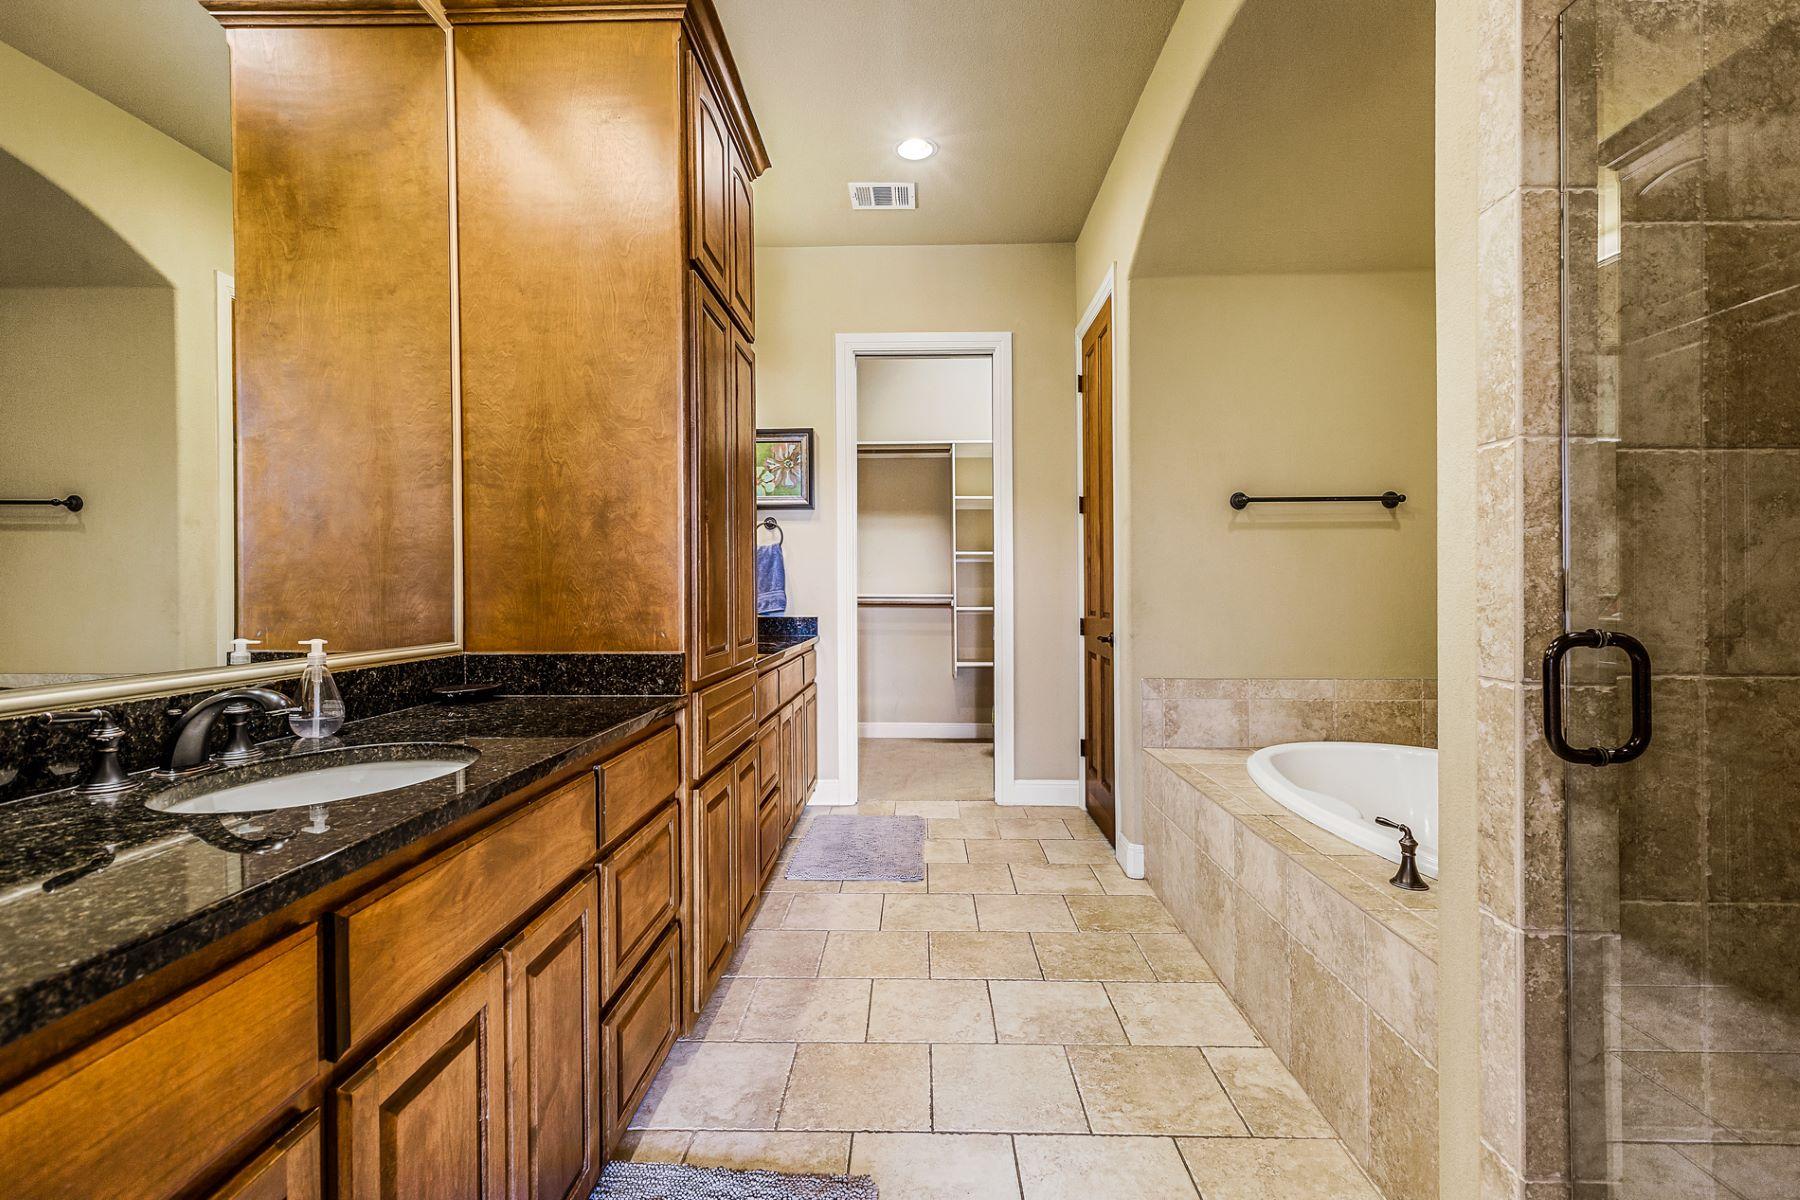 Additional photo for property listing at 423 Marina Village Cove, Austin 423 Marina Village Cv Austin, Texas 78734 Estados Unidos